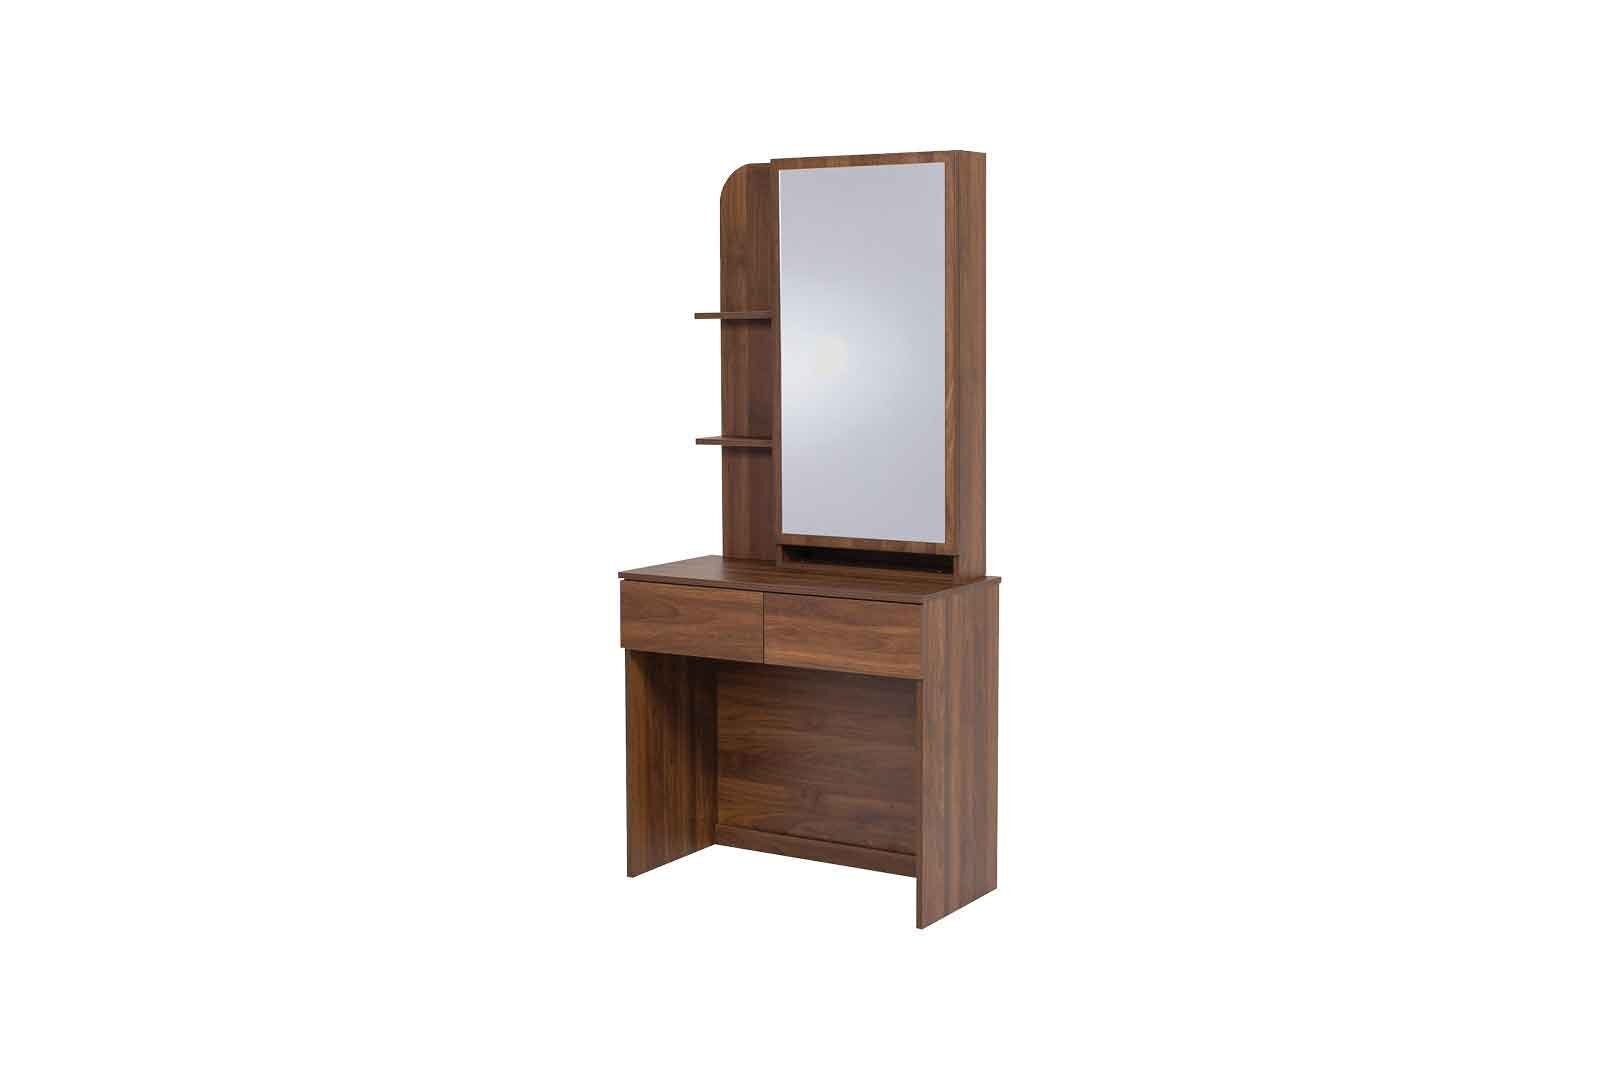 Wooden Dresser With Storage Fullhouse